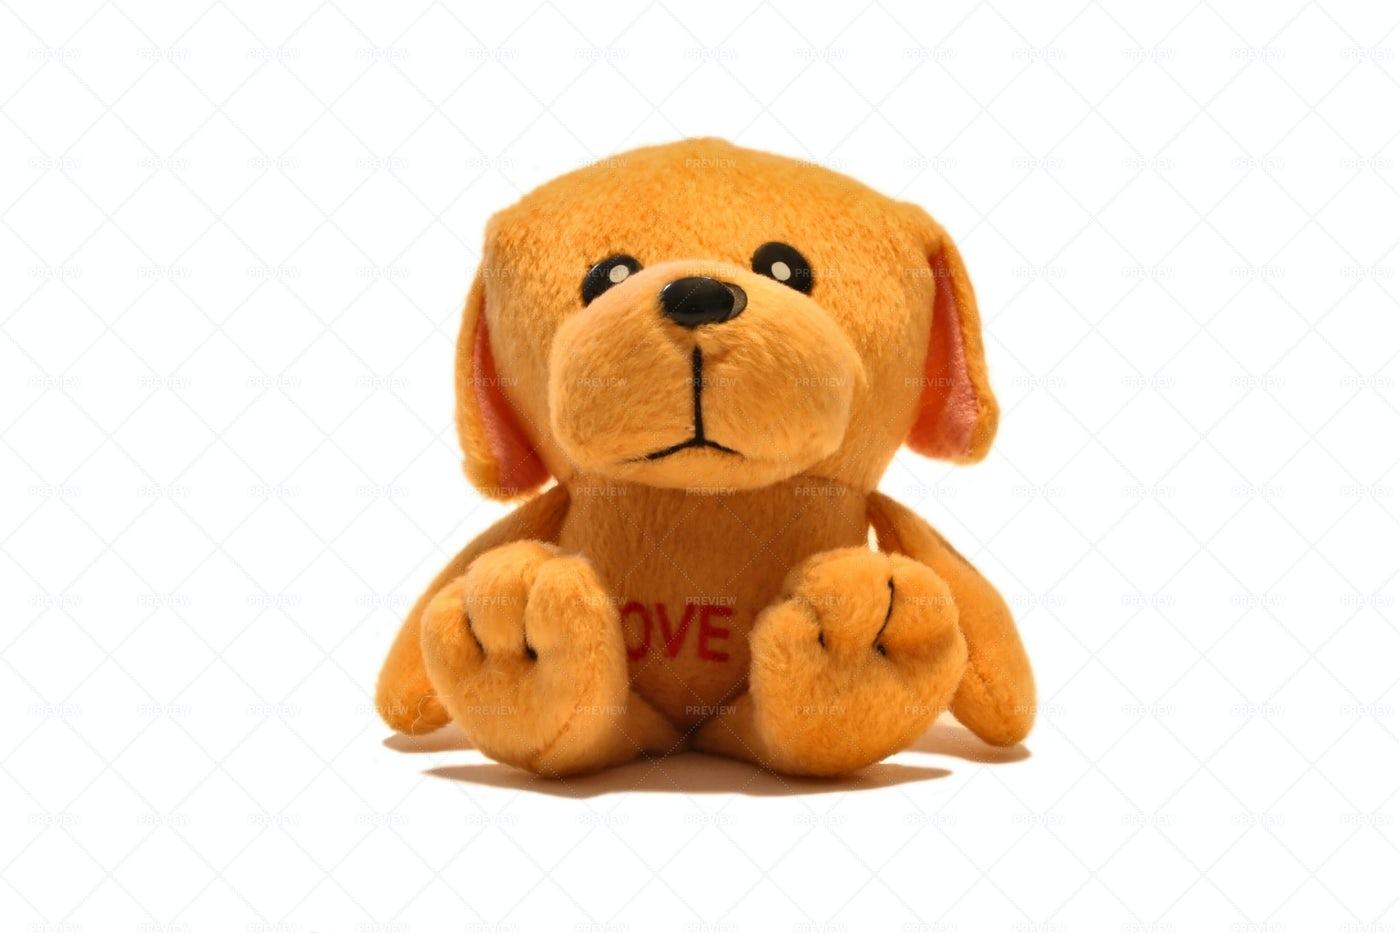 Little Dog Toy: Stock Photos